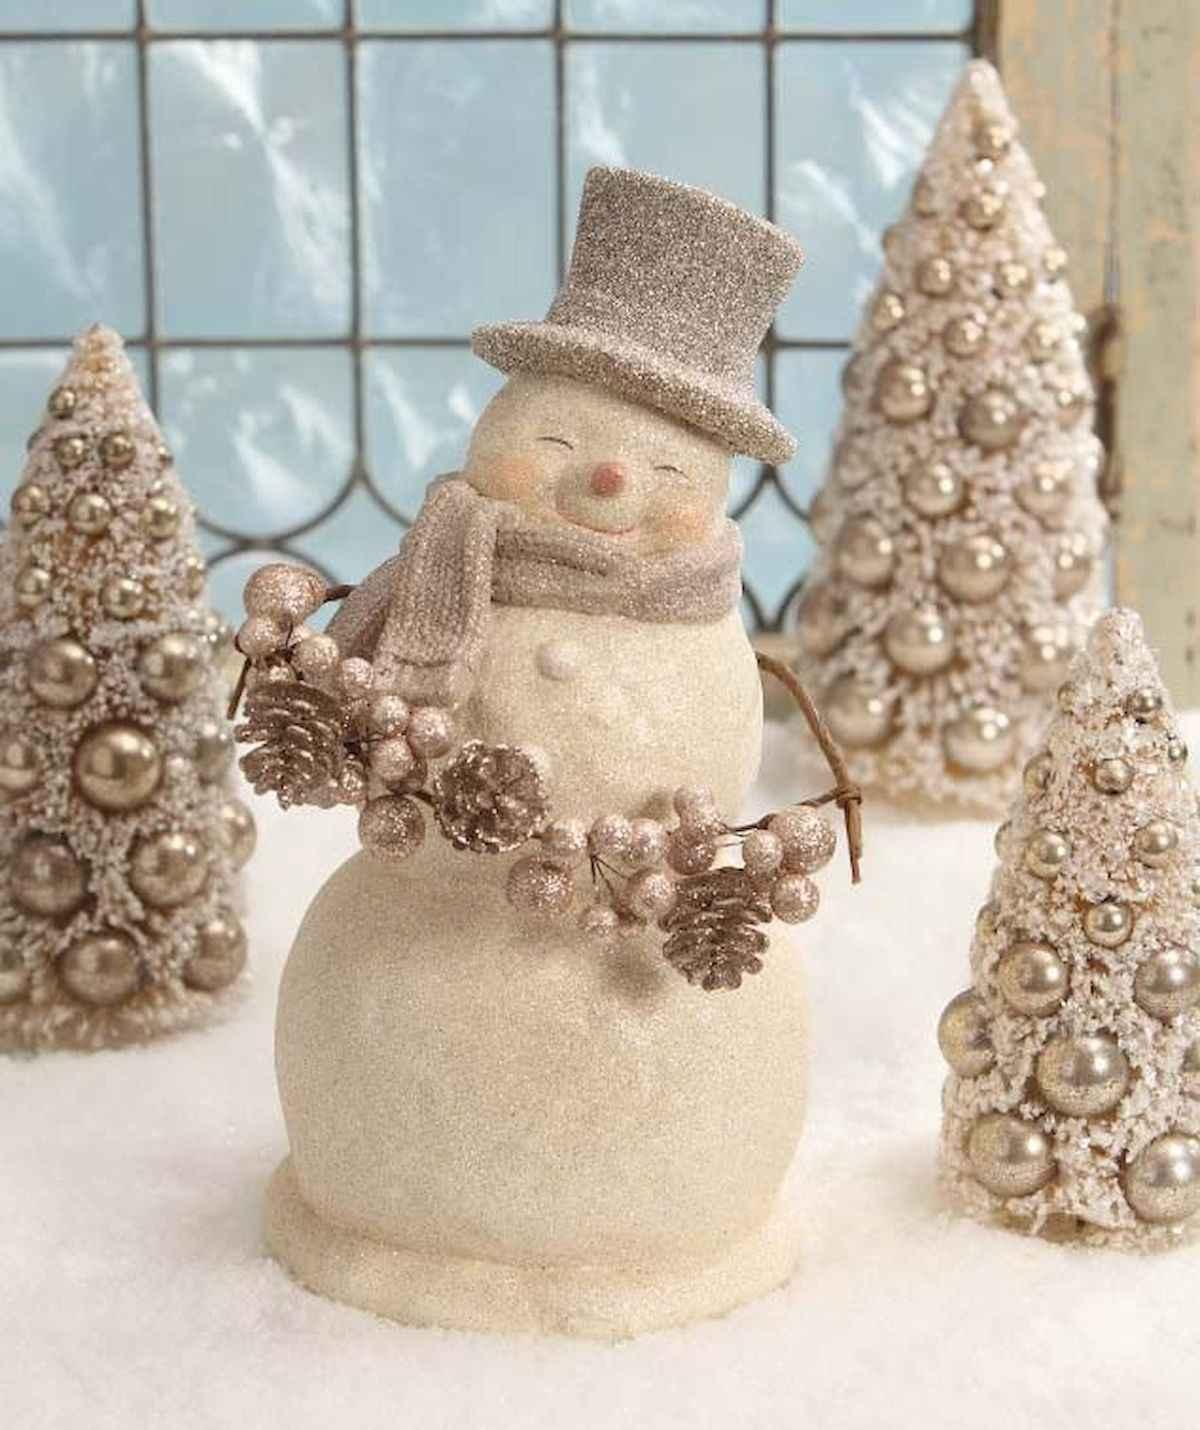 40 unique christmas tree ideas decorations (20)